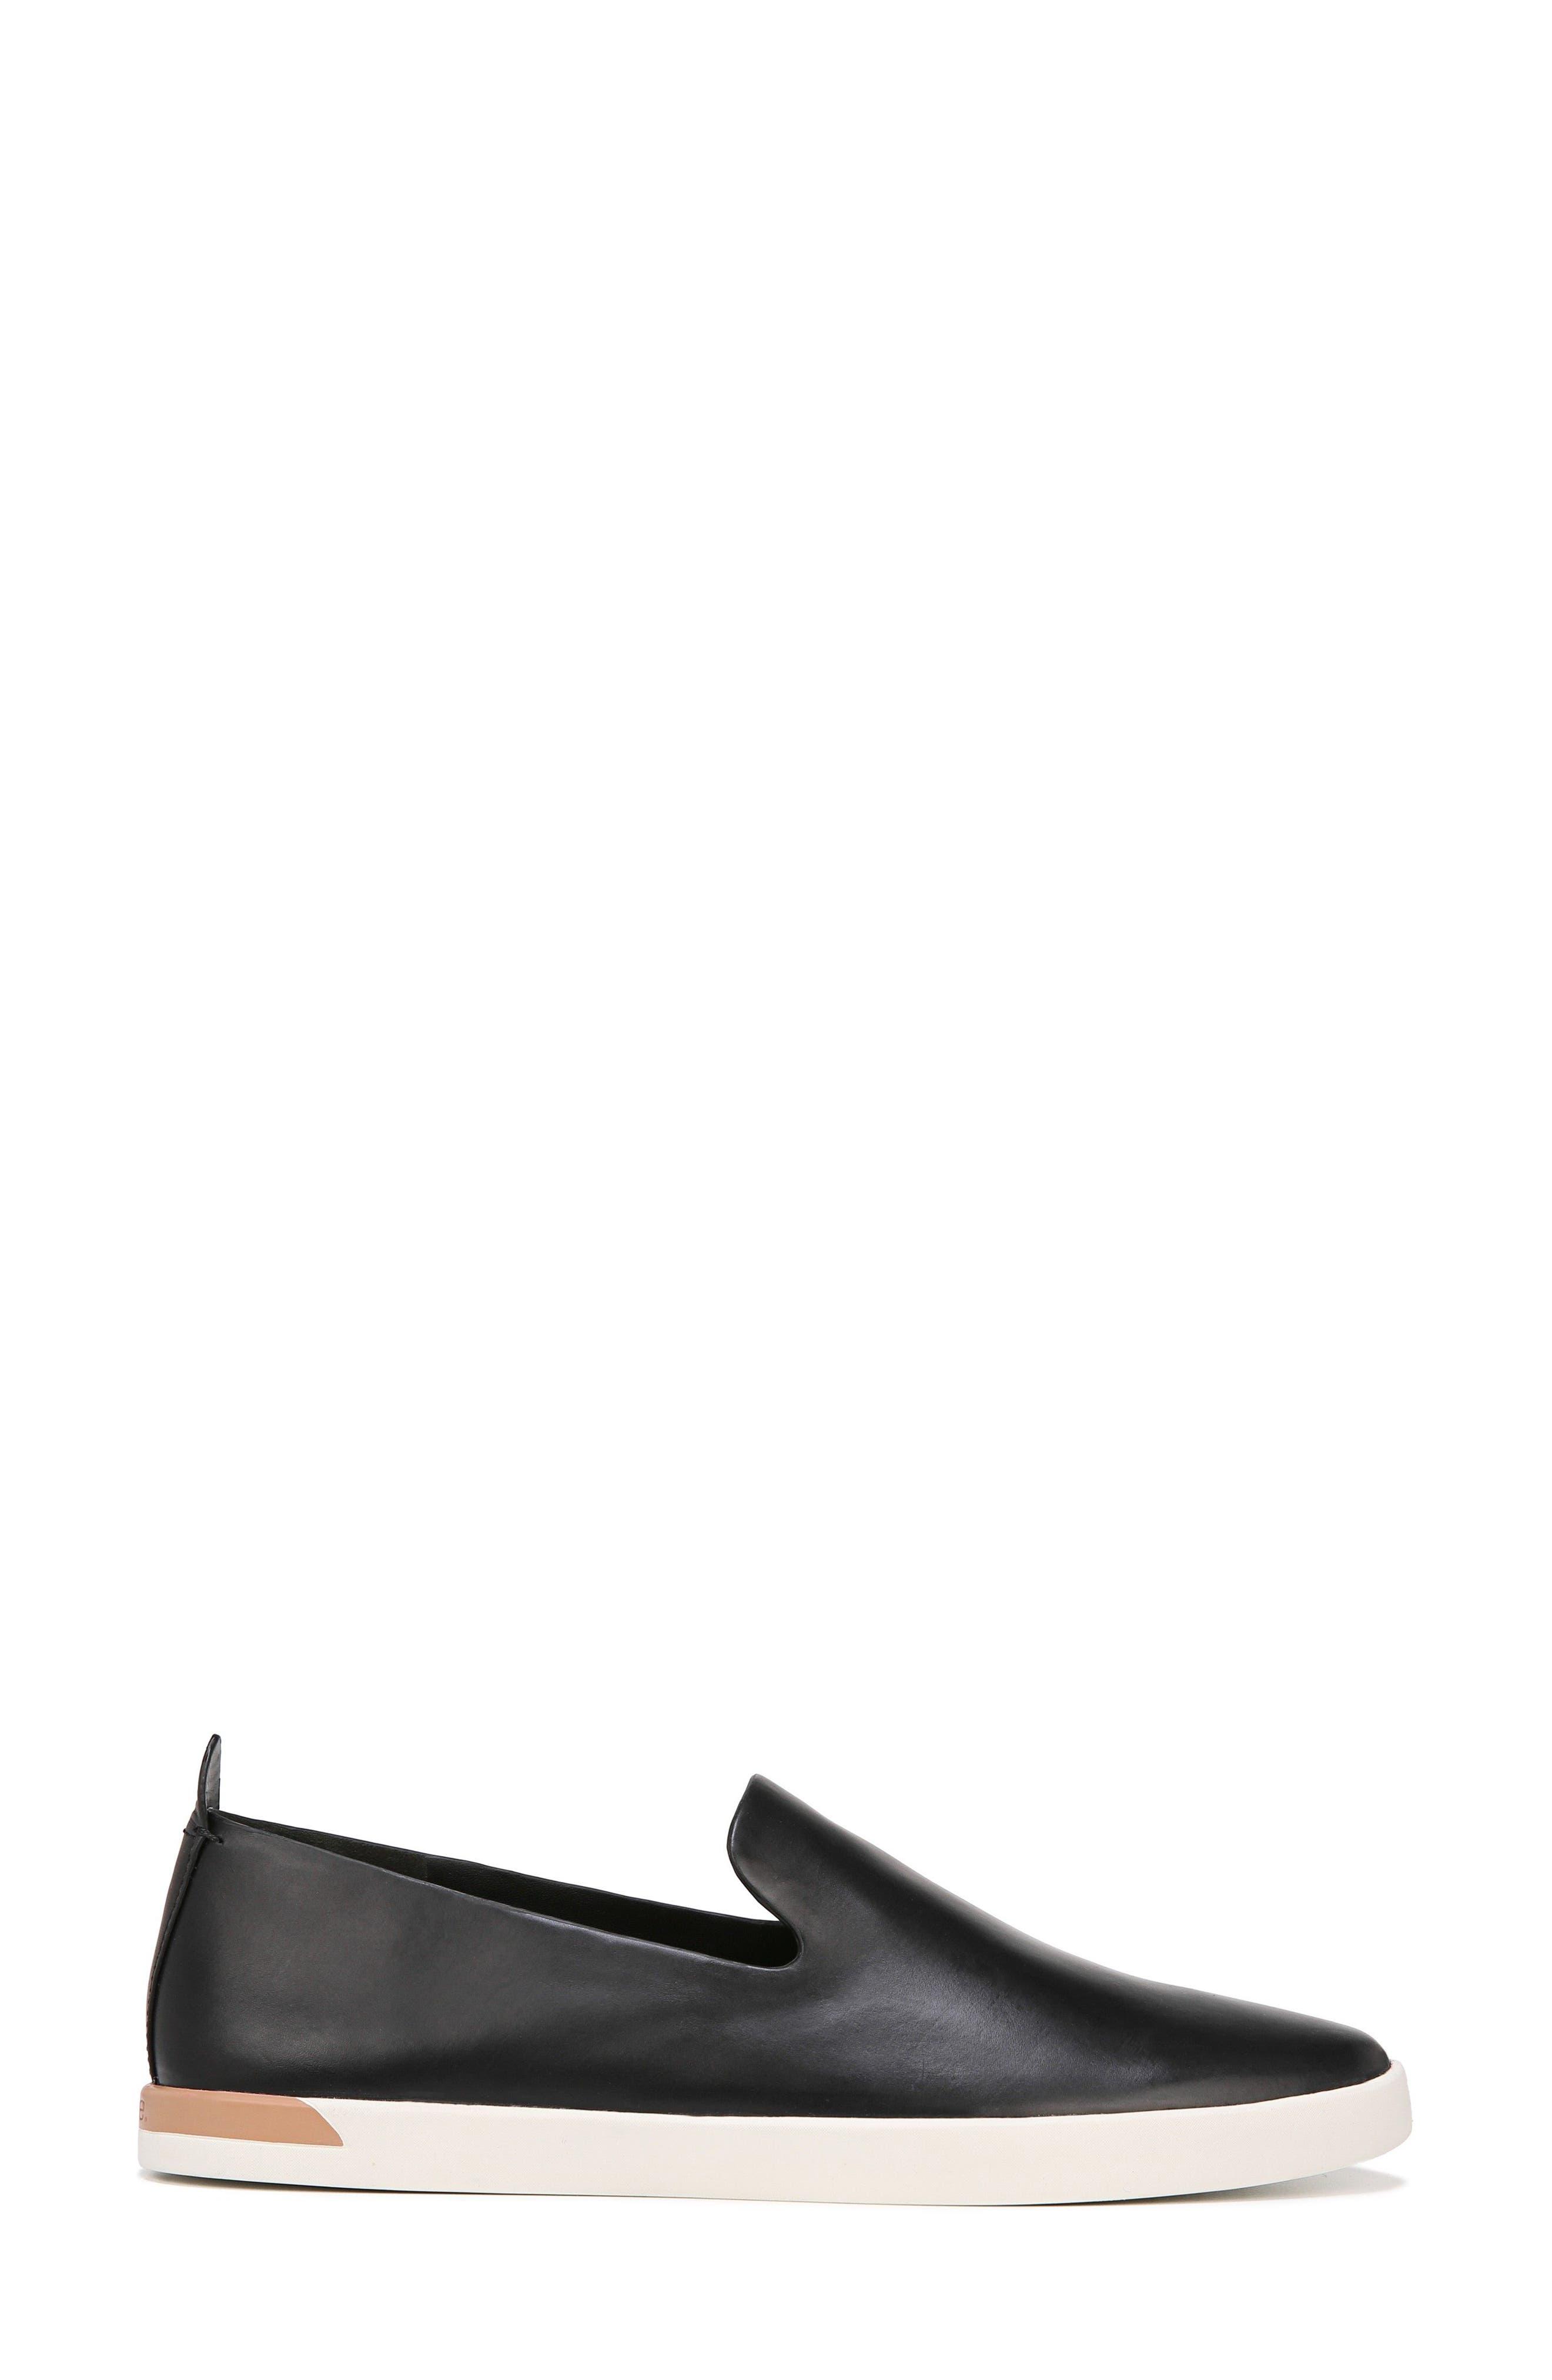 Vero Sneaker,                             Alternate thumbnail 3, color,                             Black Leather